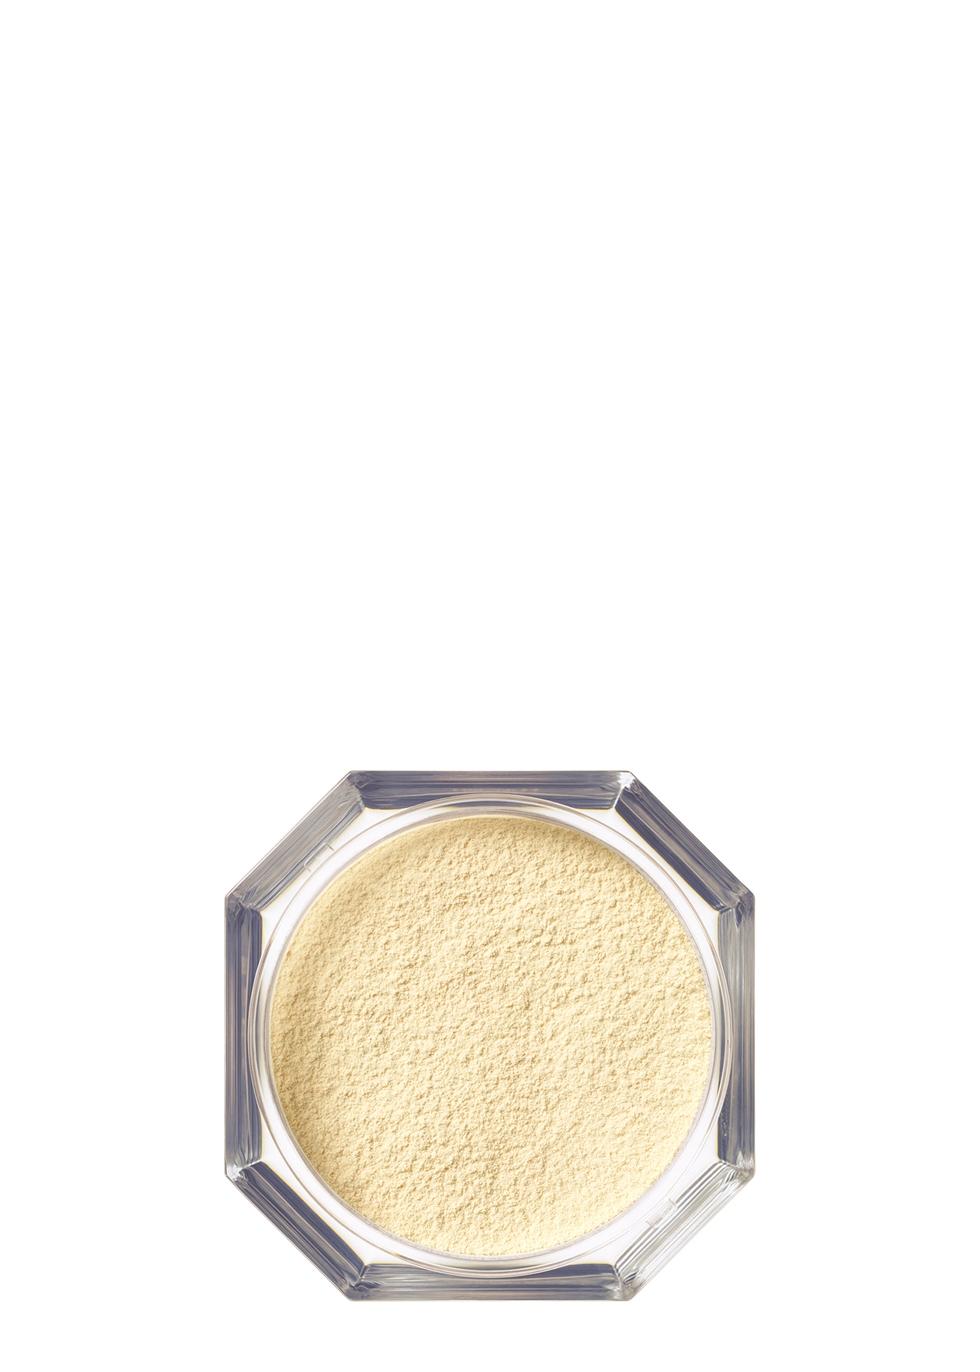 Pro Filt'r Instant Retouch Setting Powder - Butter - FENTY BEAUTY